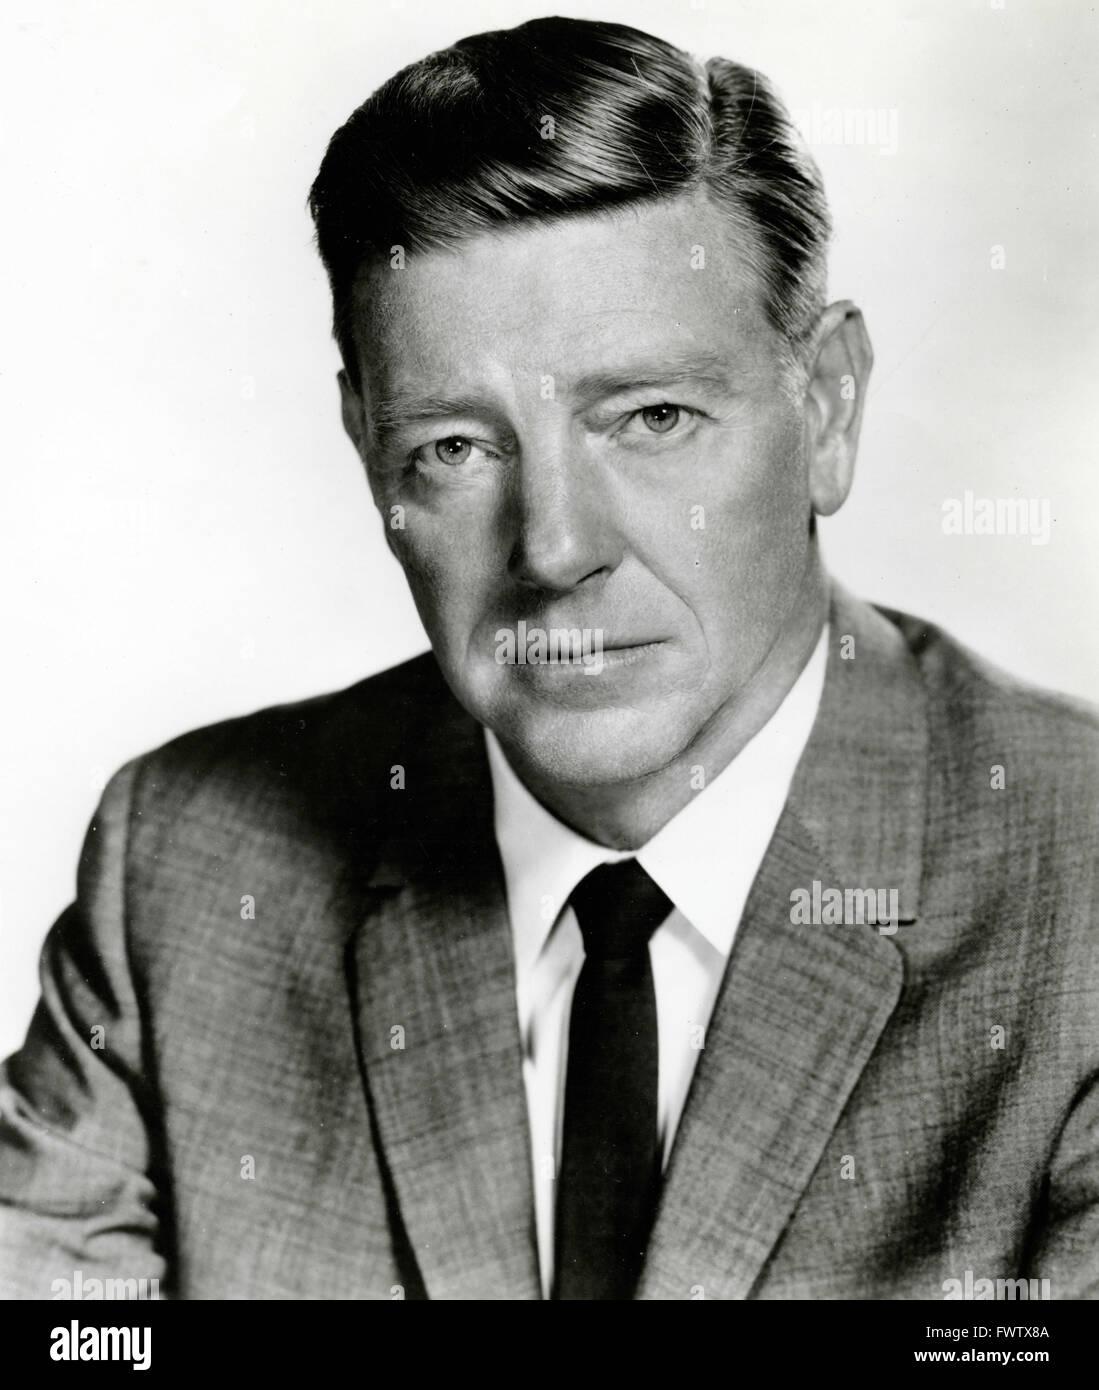 Paul Langton as Leslie Harrington in Peyton Place, USA 1964 - Stock Image